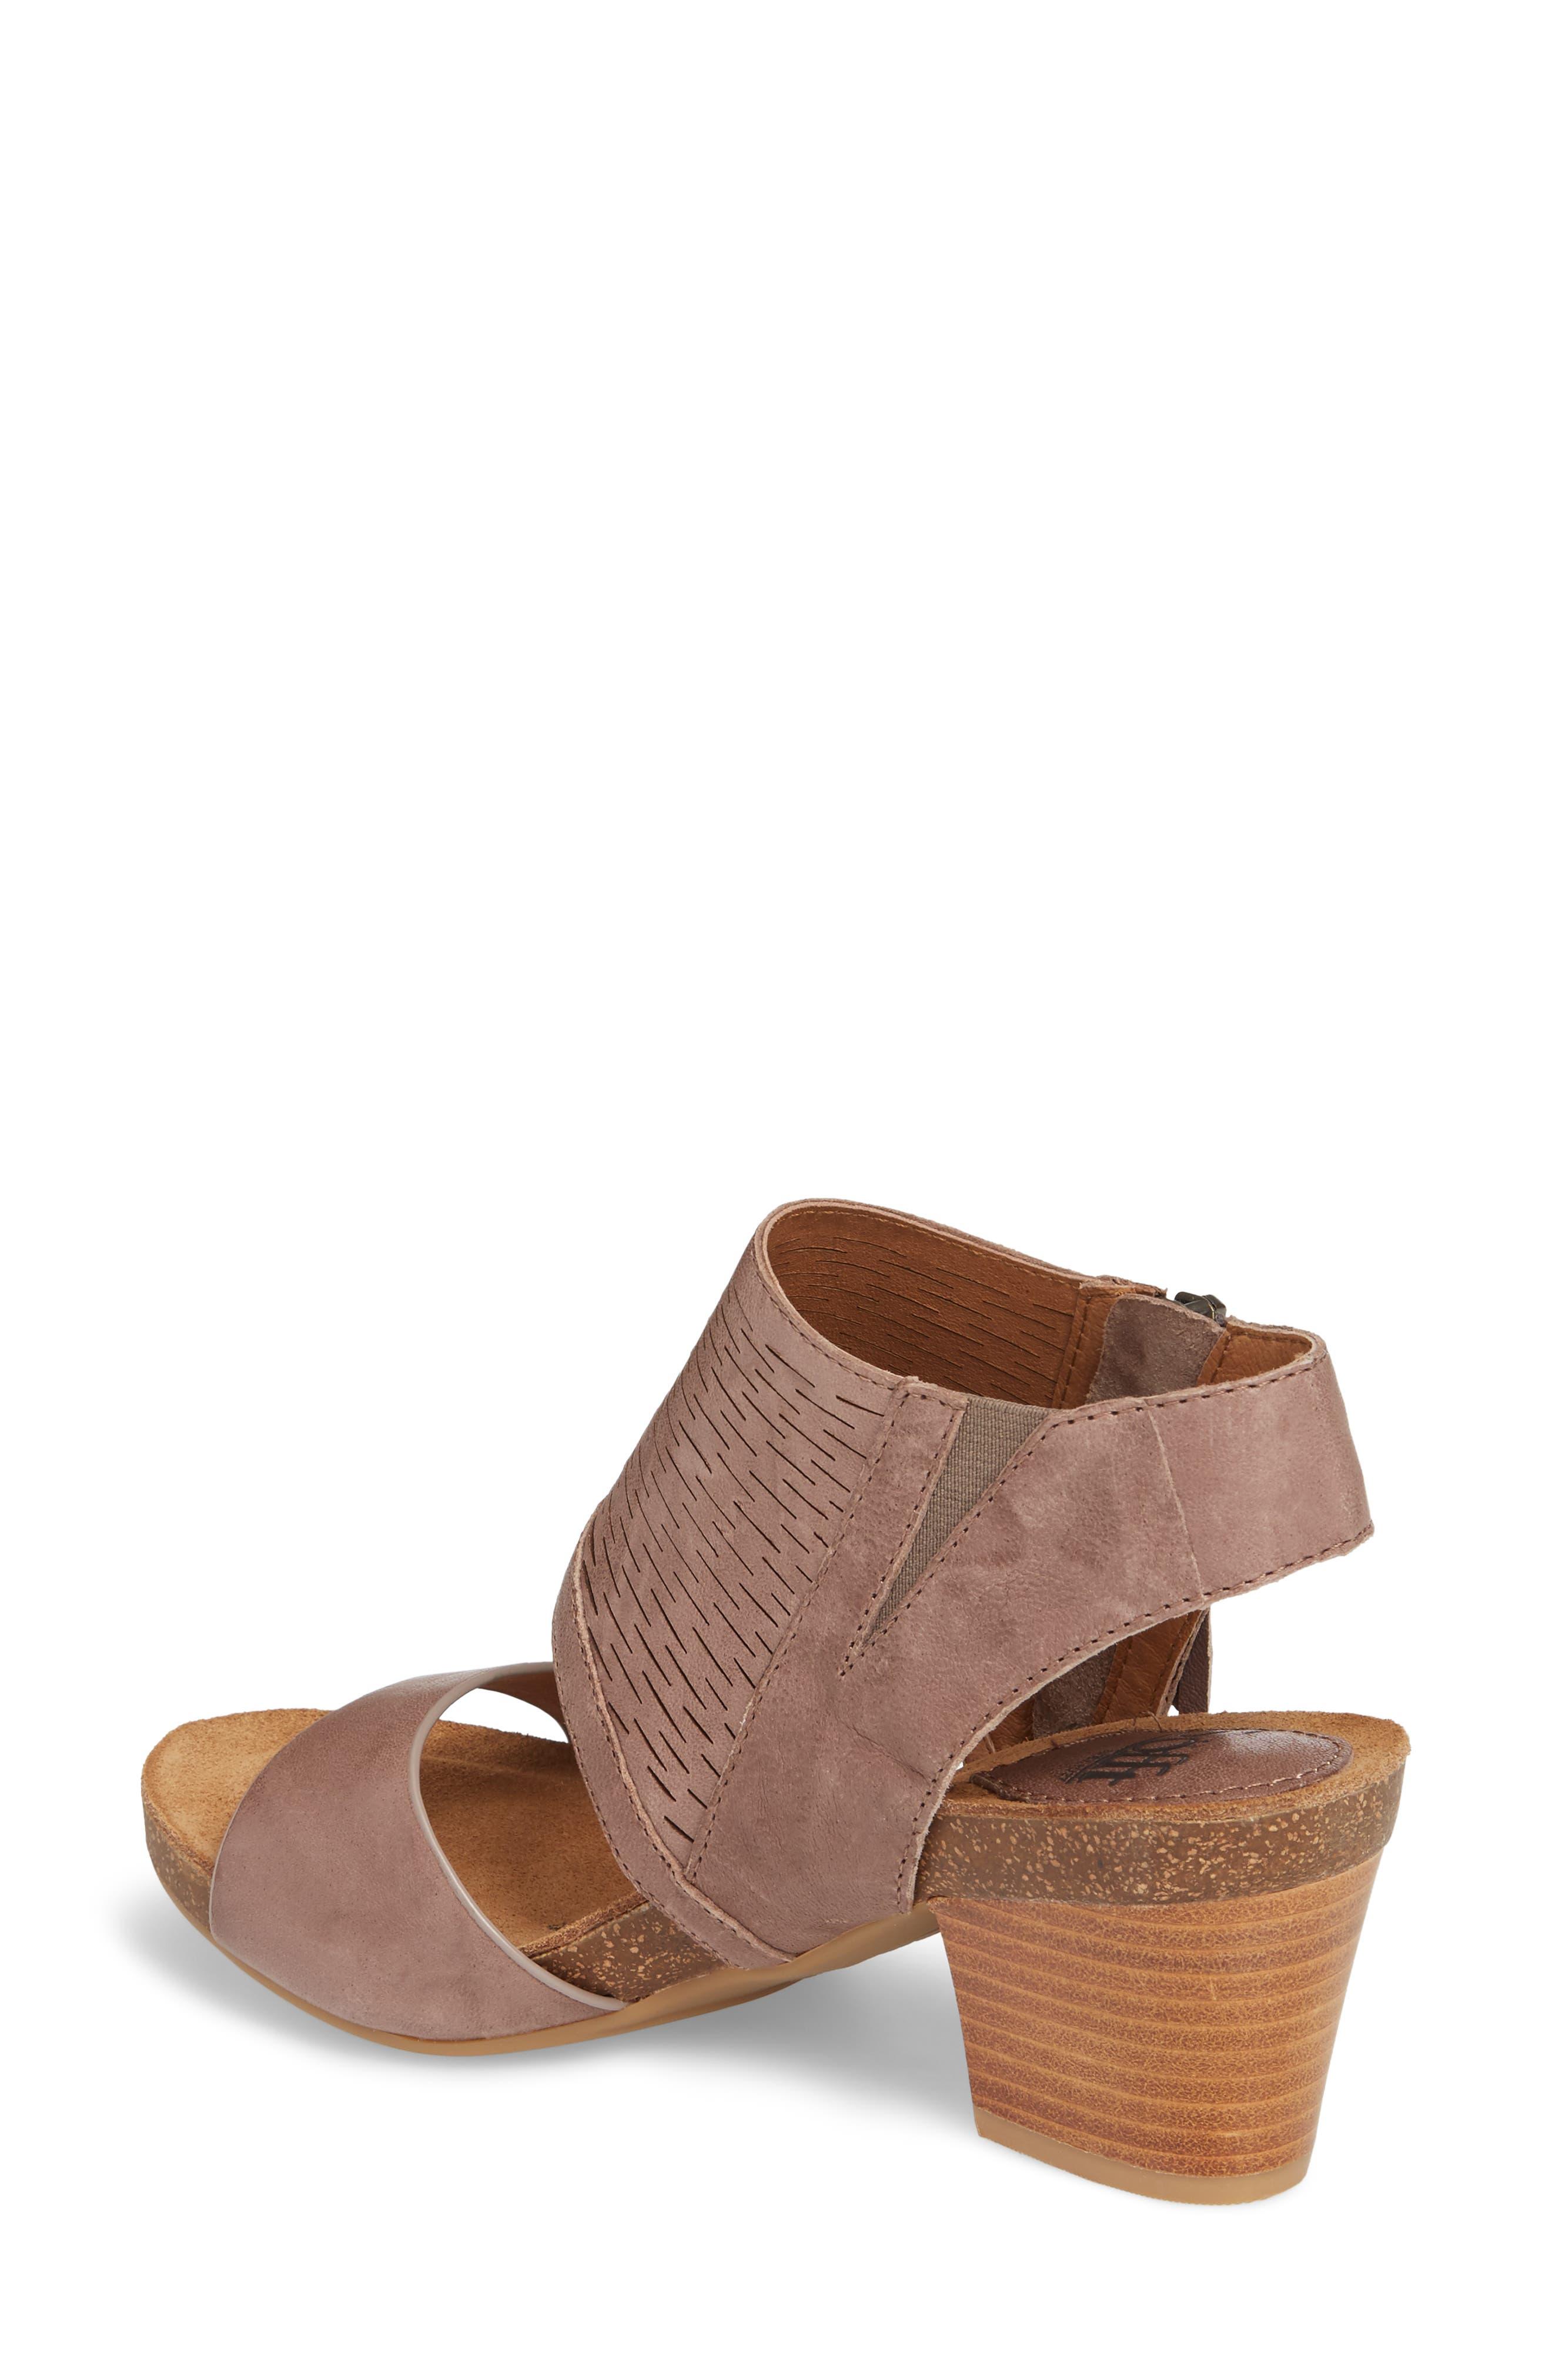 Alternate Image 2  - Söfft Milan Block Heel Sandal (Women)